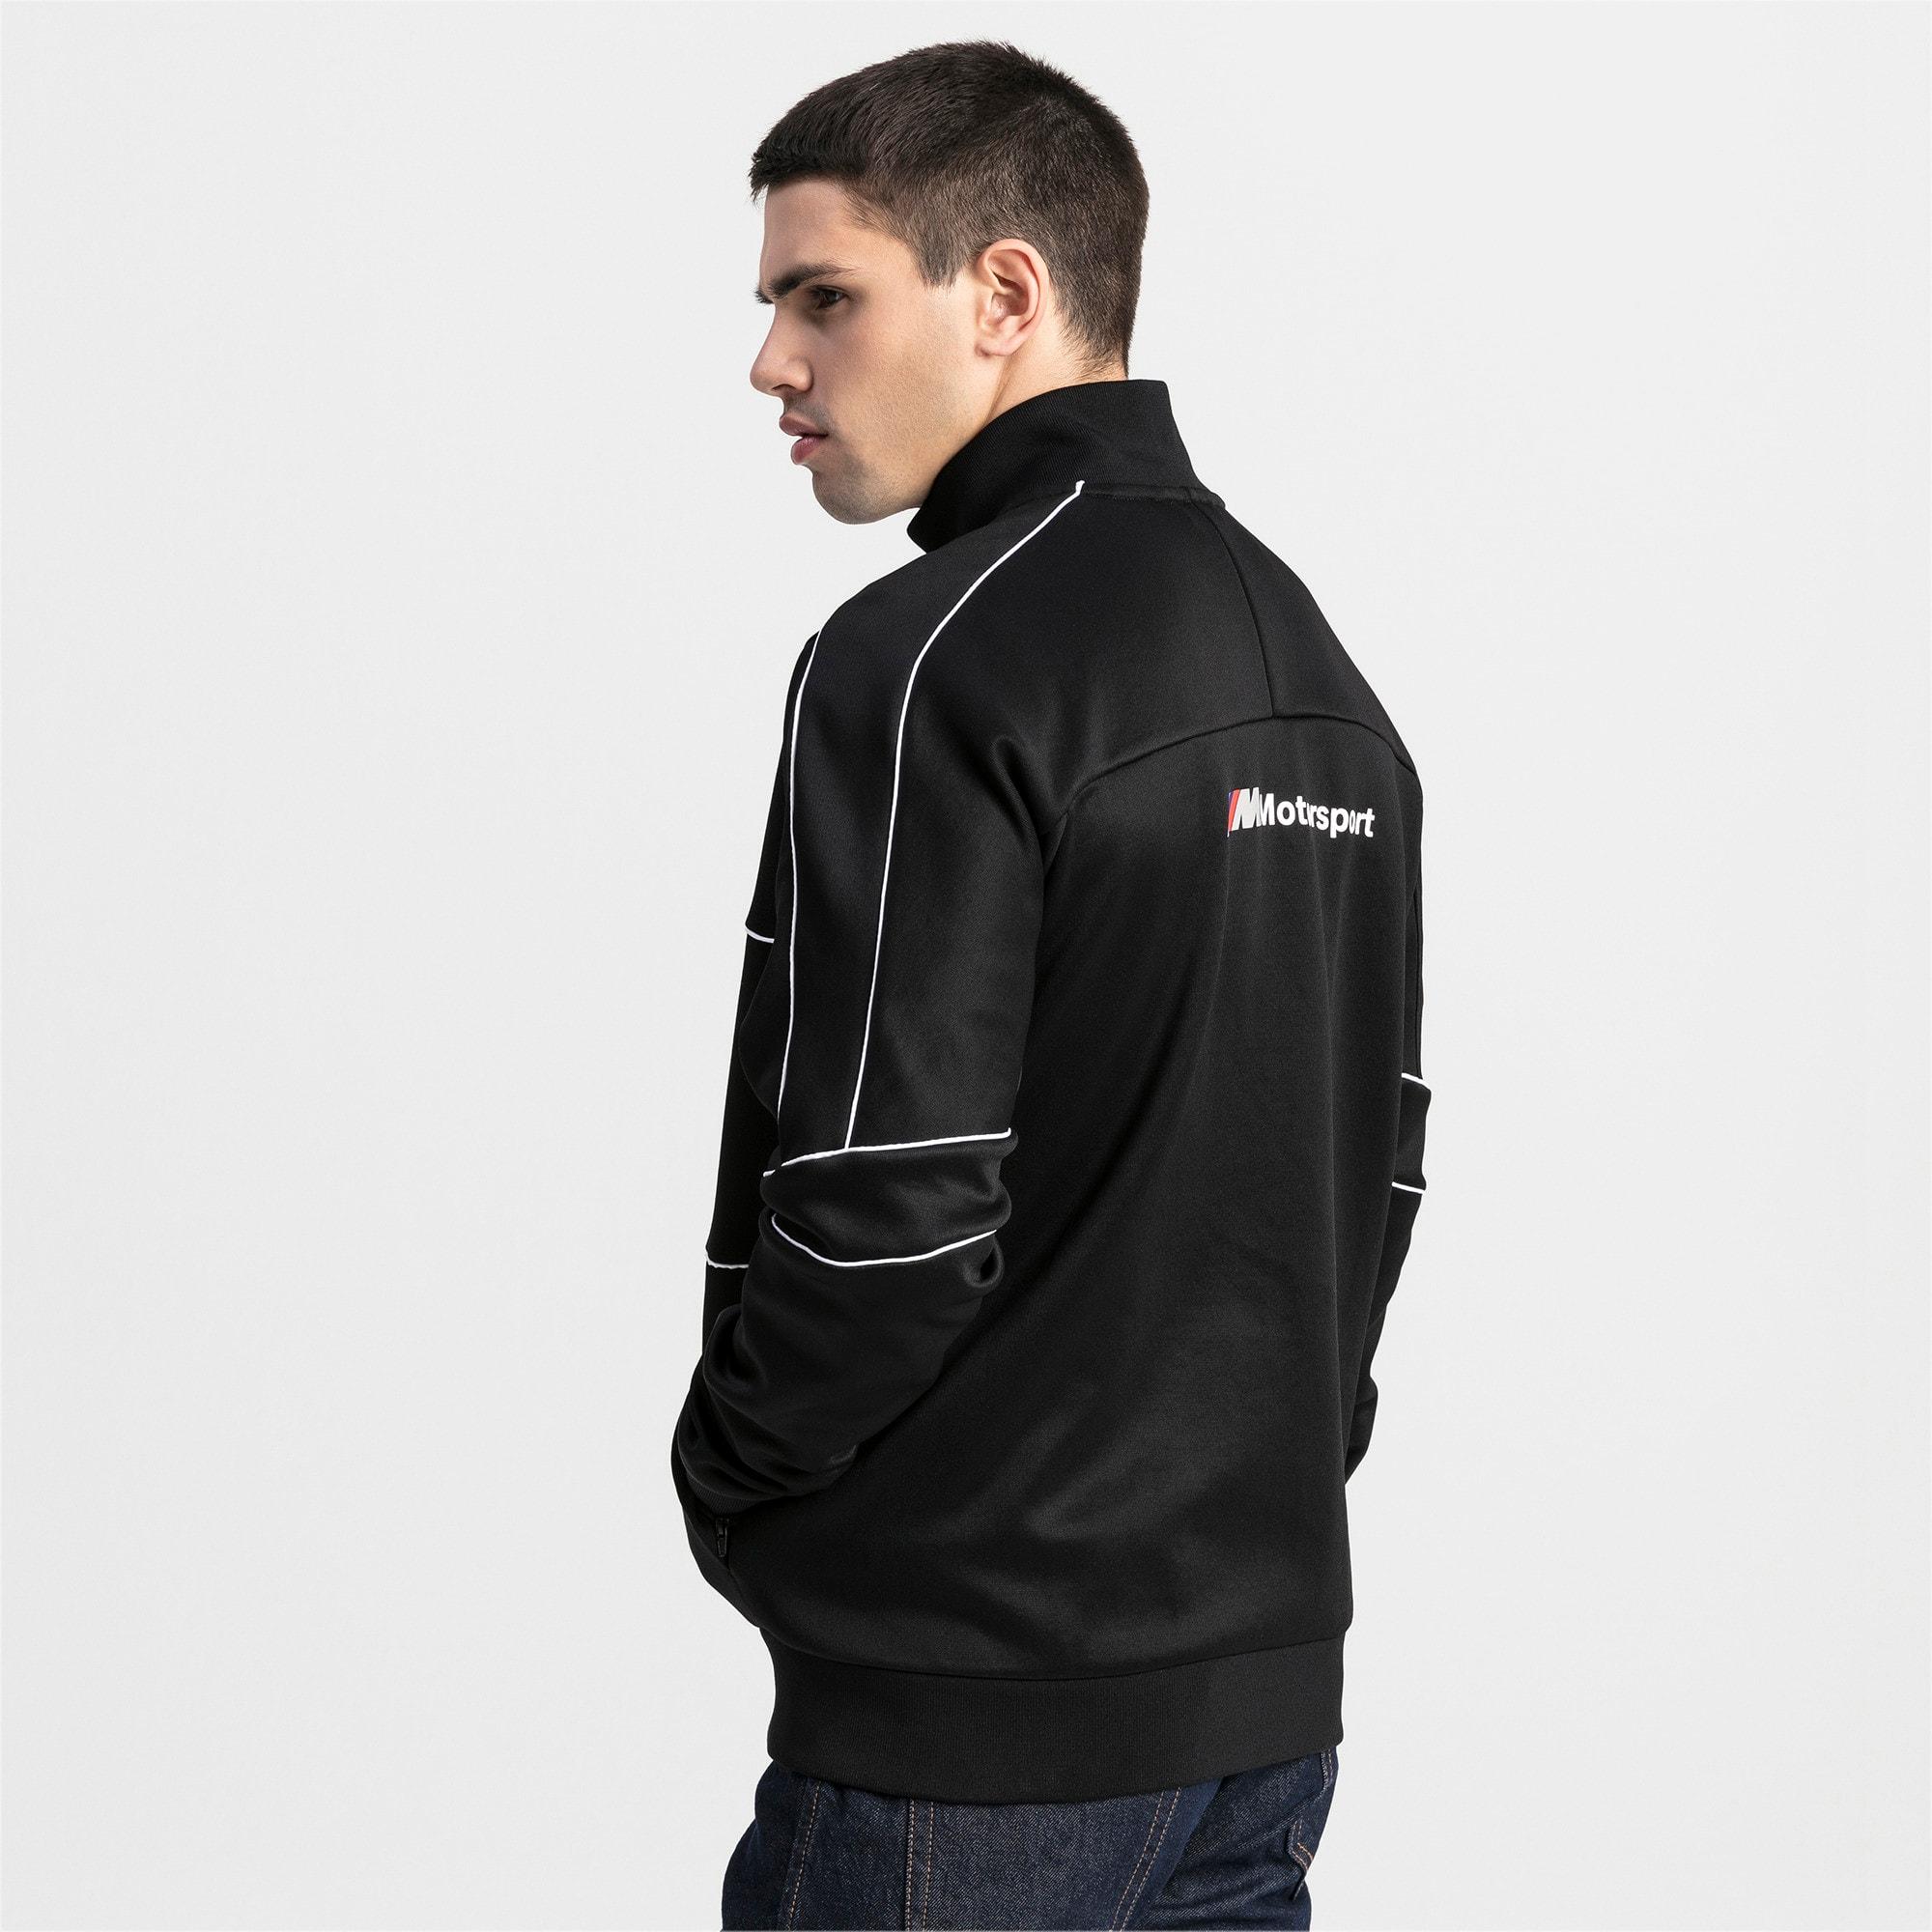 Thumbnail 2 of BMW M Motorsports T7 Track Men's Jacket, Puma Black, medium